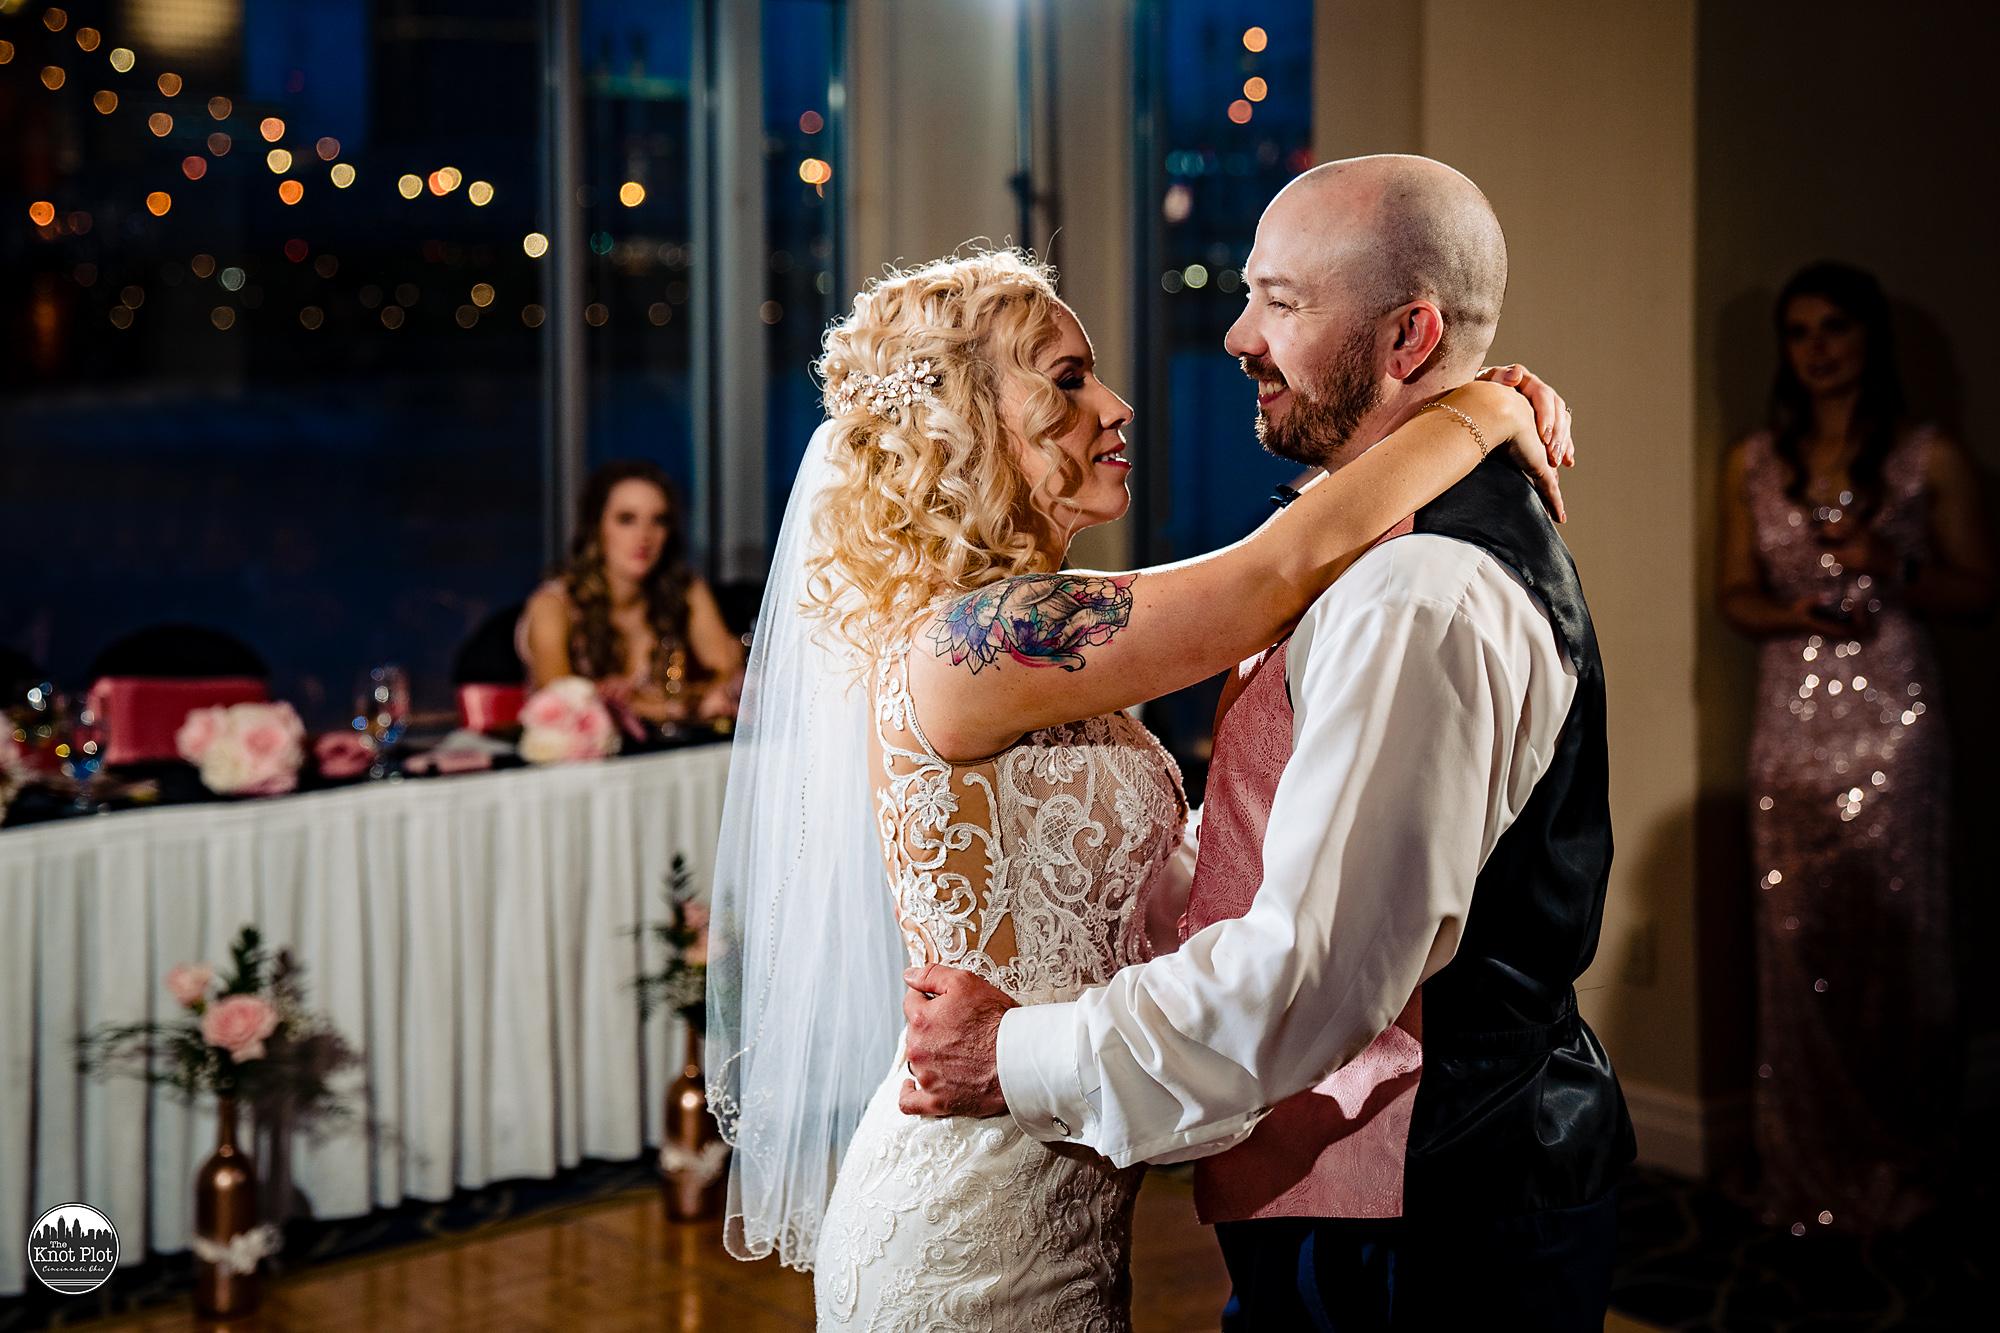 Embassy-Suites-Rivercenter-Cincinnati-Wedding-Photography-25.jpg